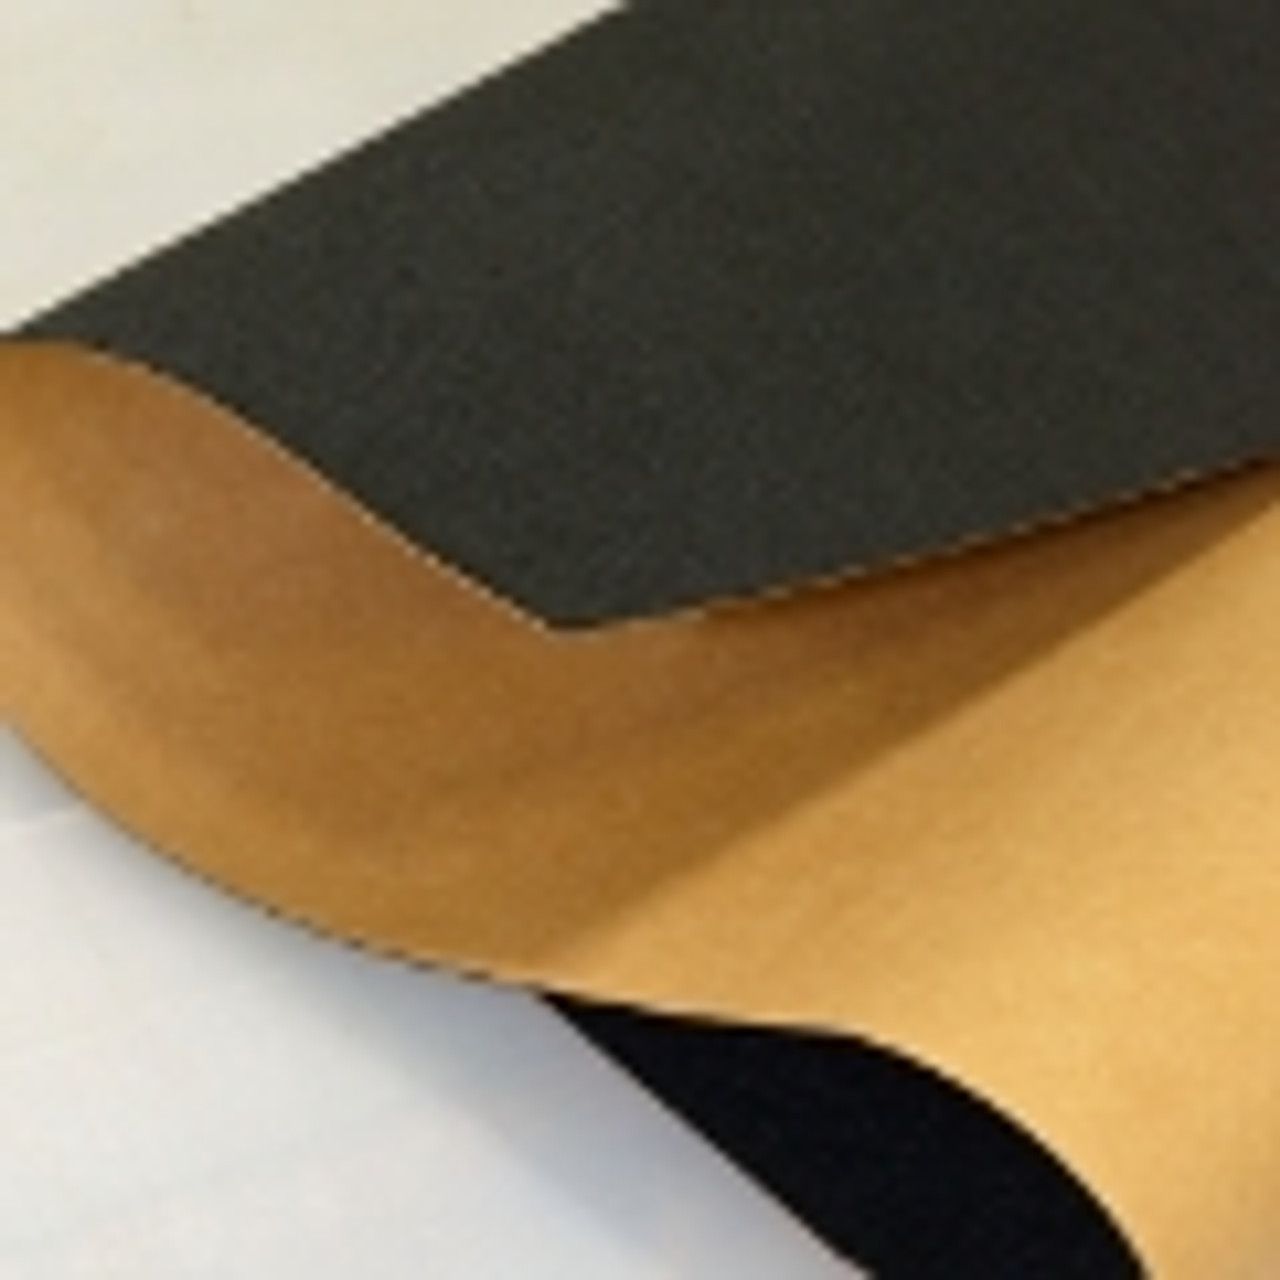 Black Polyester, Adhesive Backed